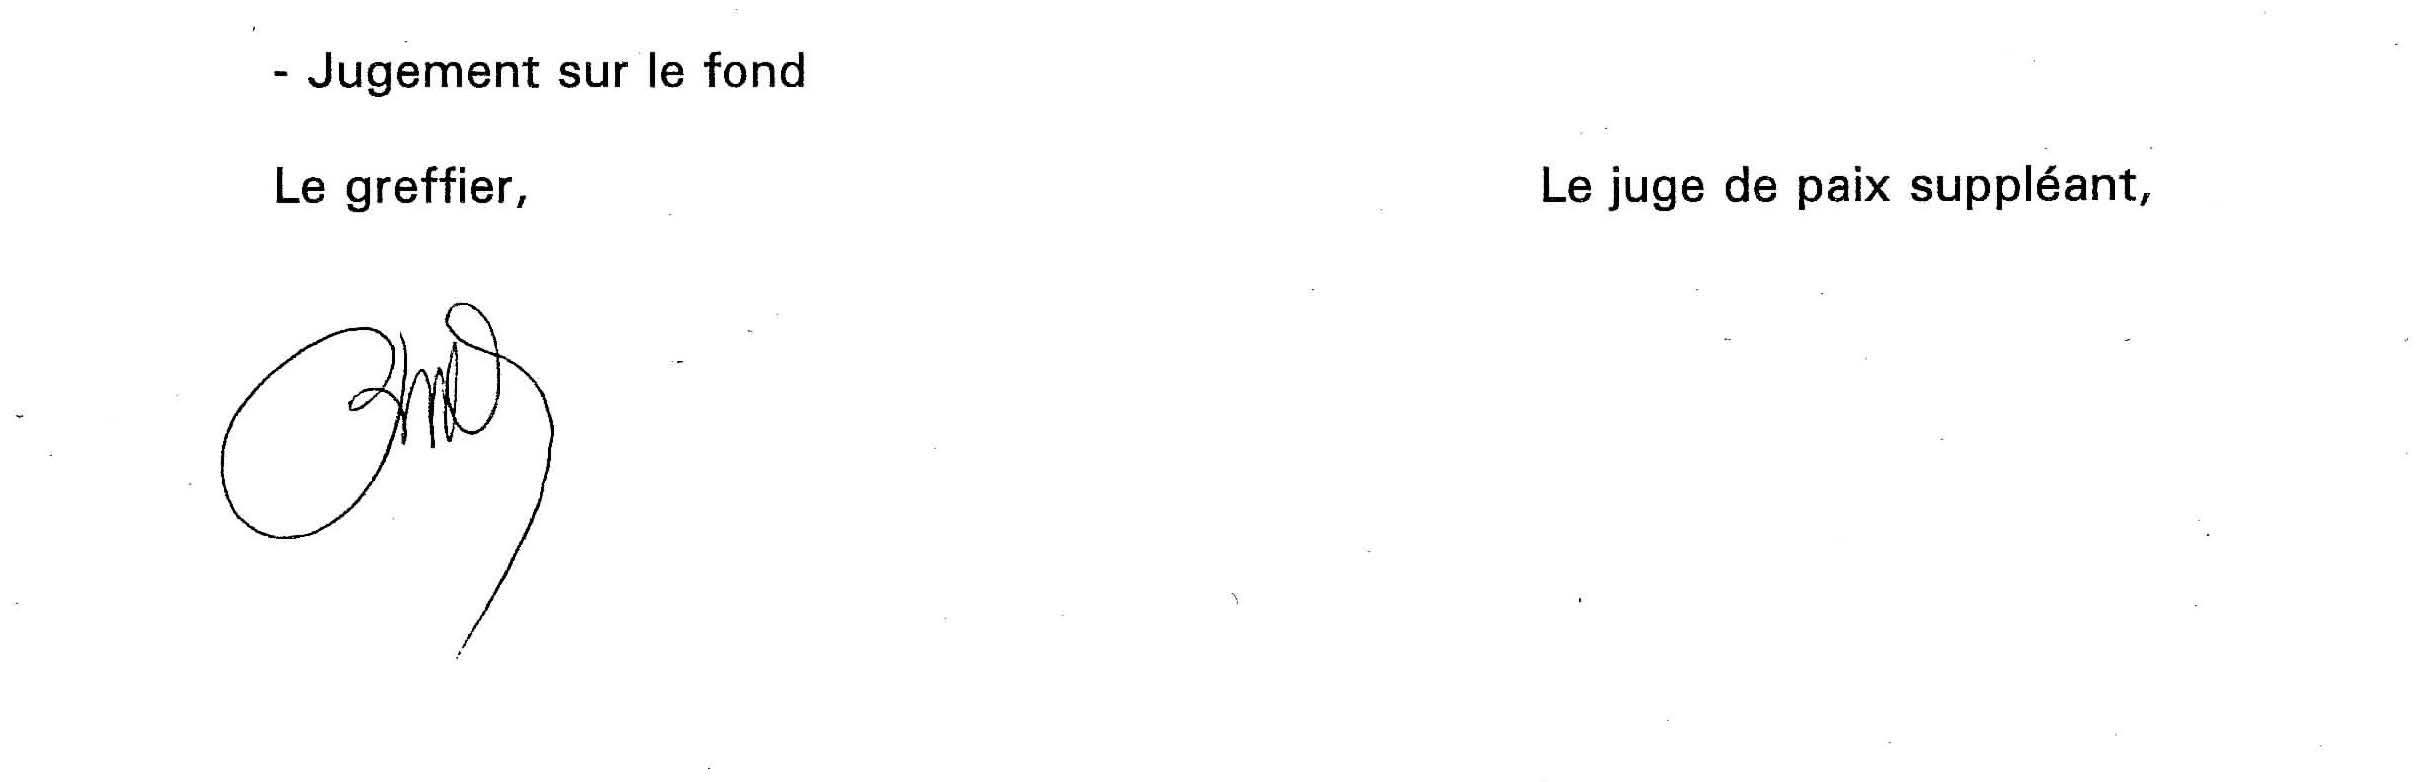 2008-11-26_piece_JPXL_46_Page_1.jpg